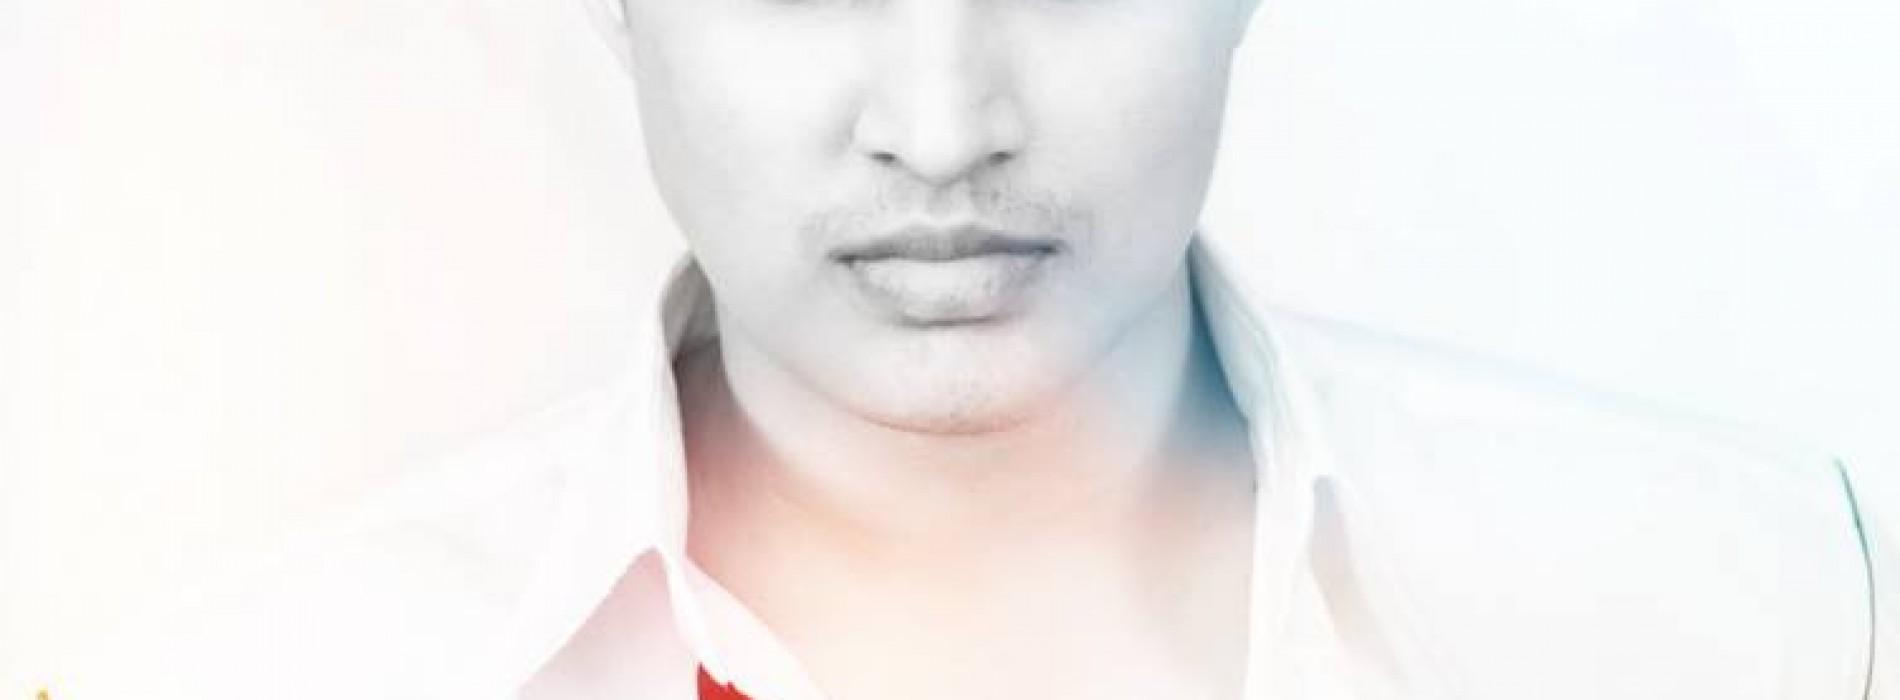 Sheaam Deen – I'm Not Afraid To Fall